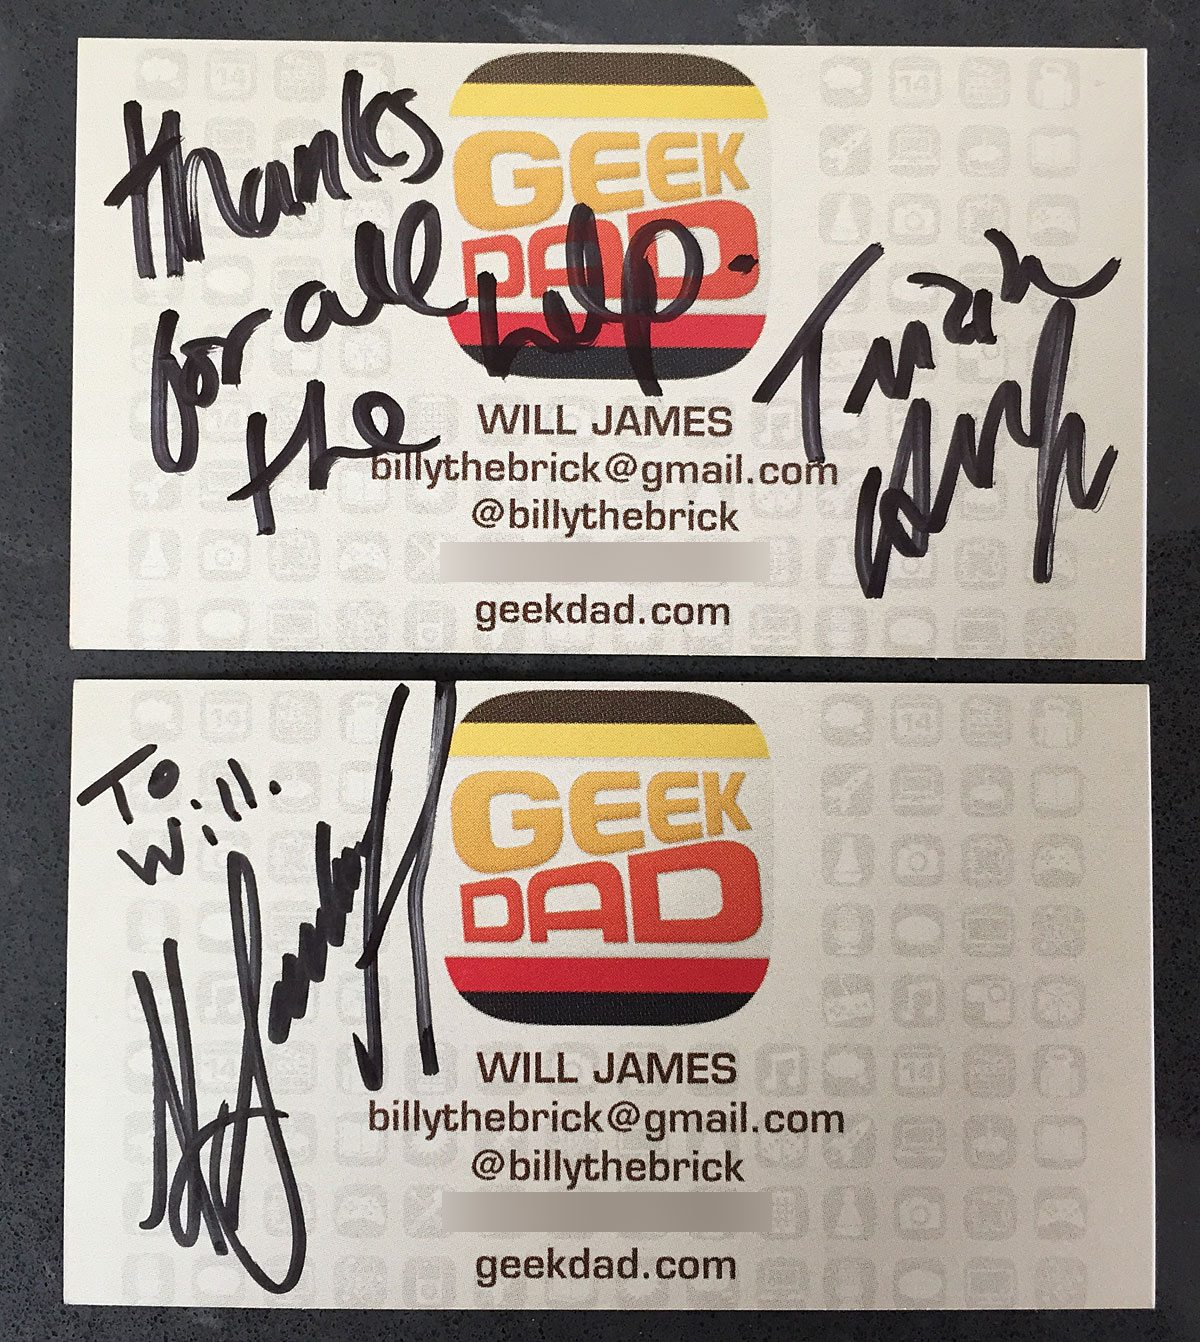 BSG-Autographs